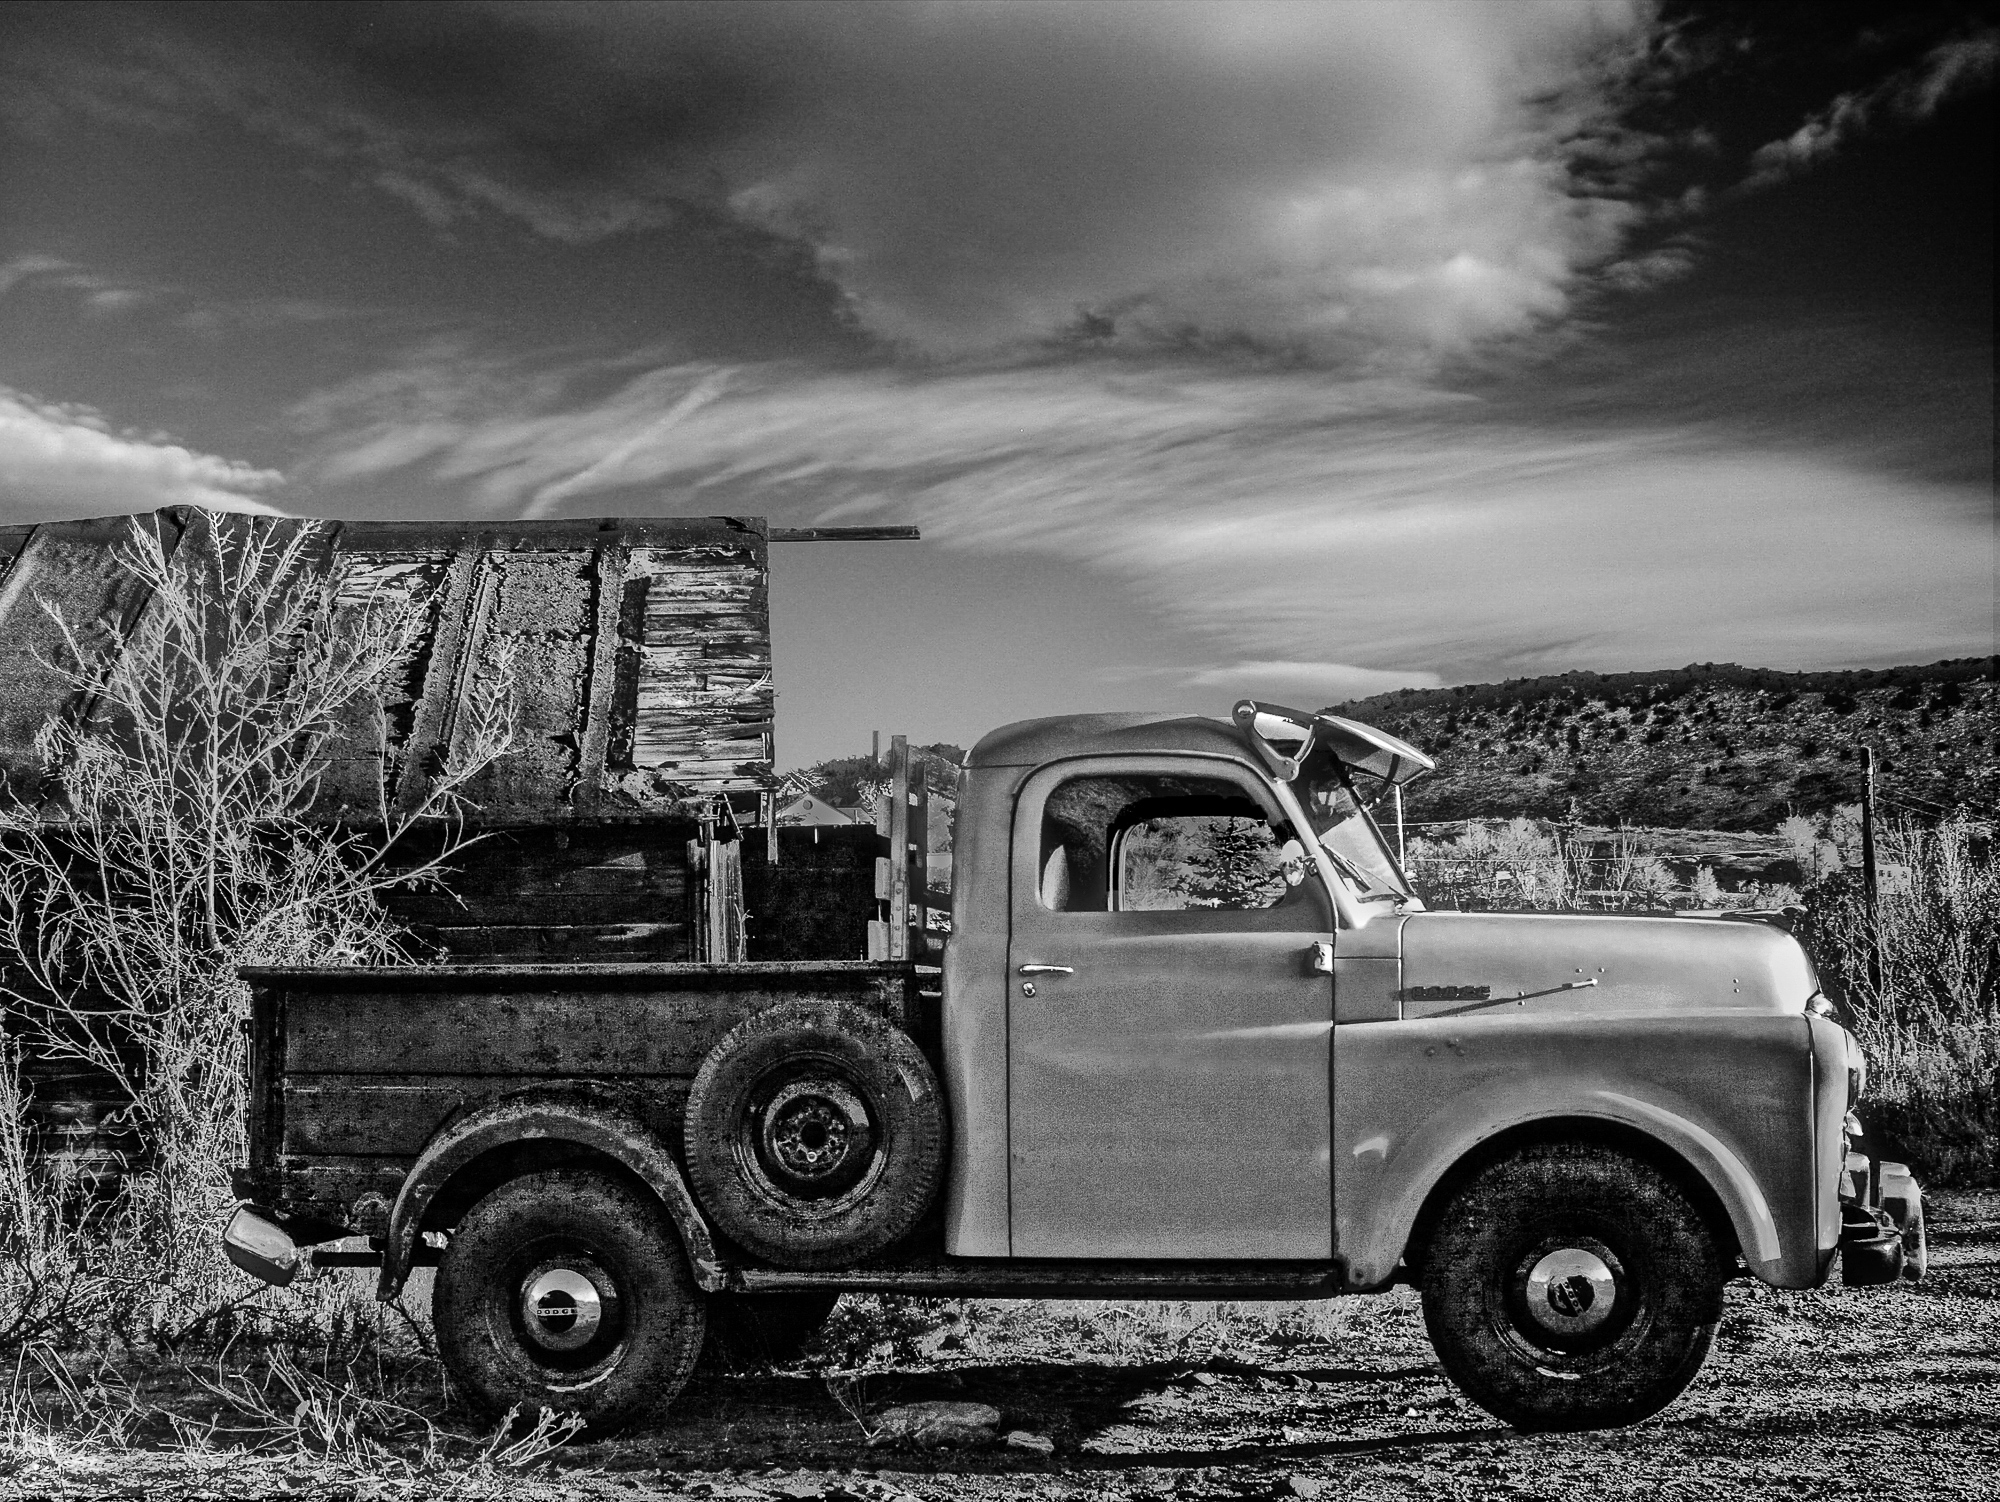 Dodge Truck B&W with sky & lighting